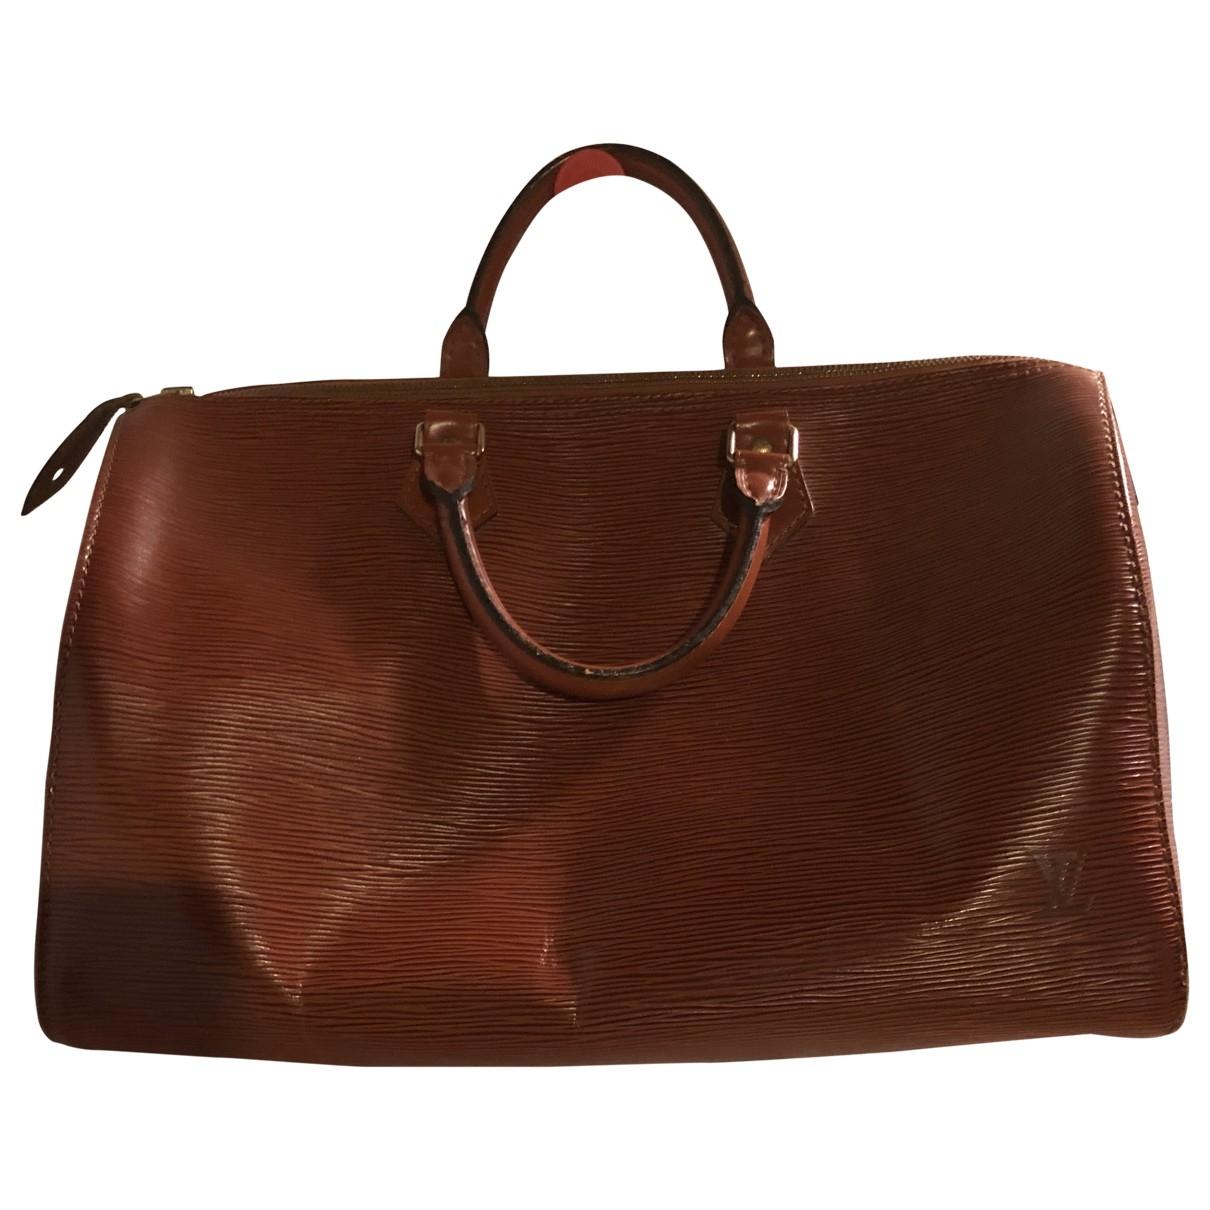 Louis Vuitton - Sac a main Speedy pour femme en cuir - camel